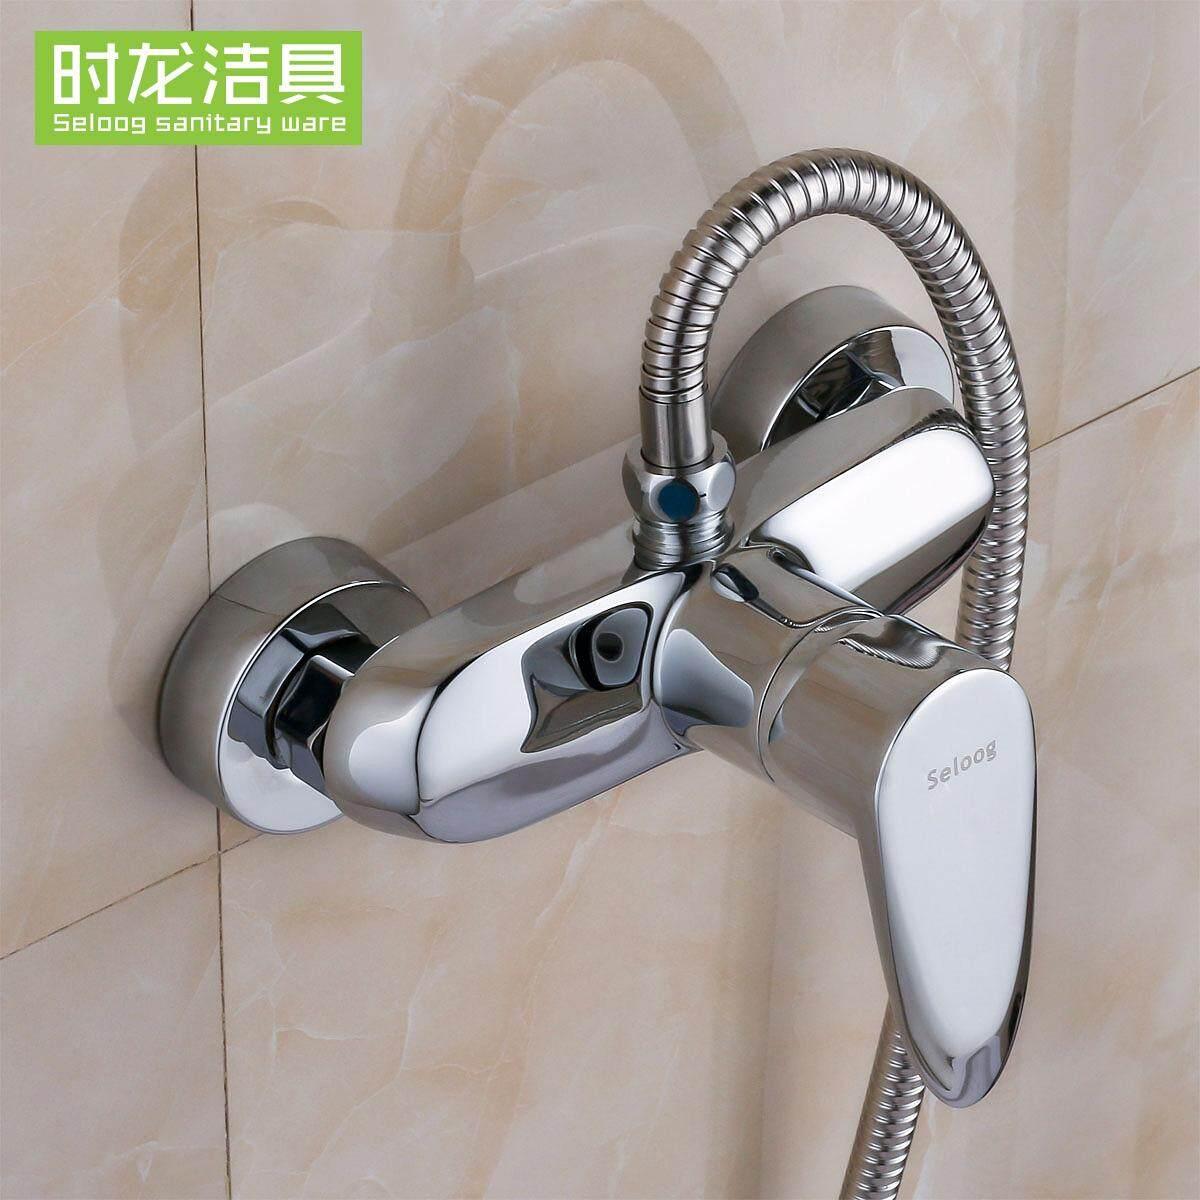 Seloog Running the Copper Body Shower Faucet Tub Leading Hose-Shower Faucet Shower